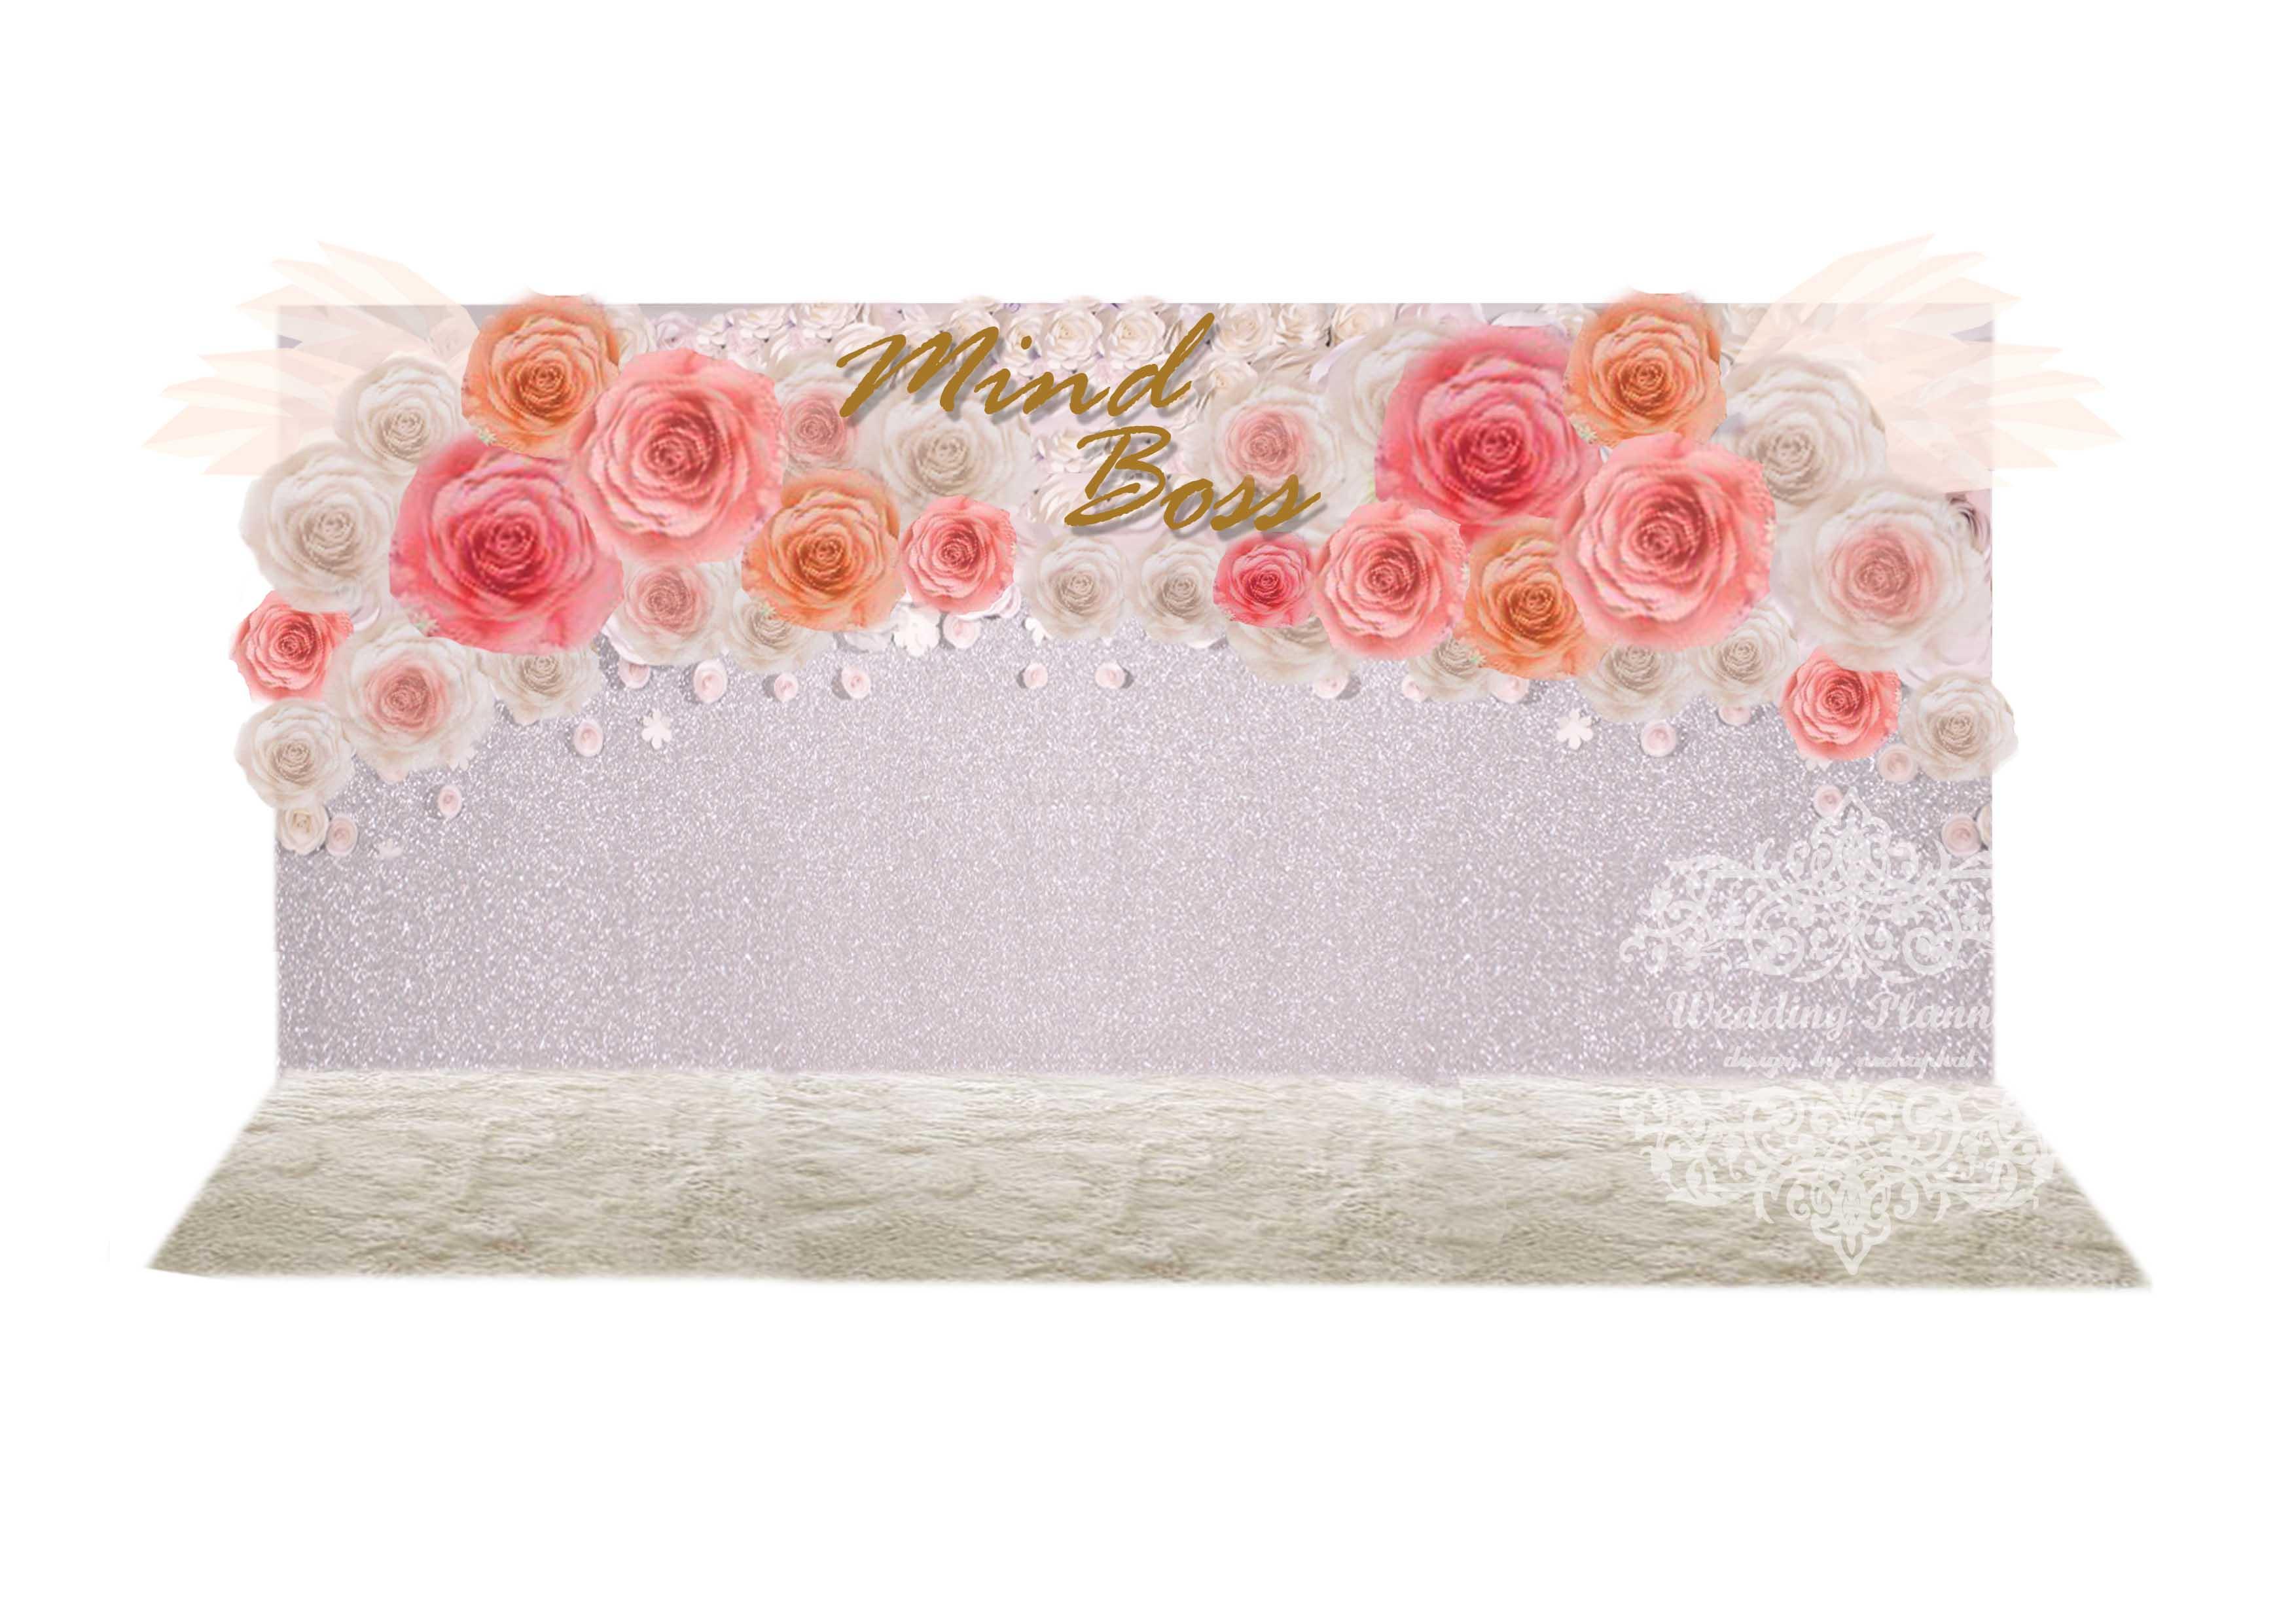 package photo backdropดอกไม้กระดาษ เช่าฉากถ่ายภาพงานแต่งงานโทนชมพู ยาว3.60เมตร